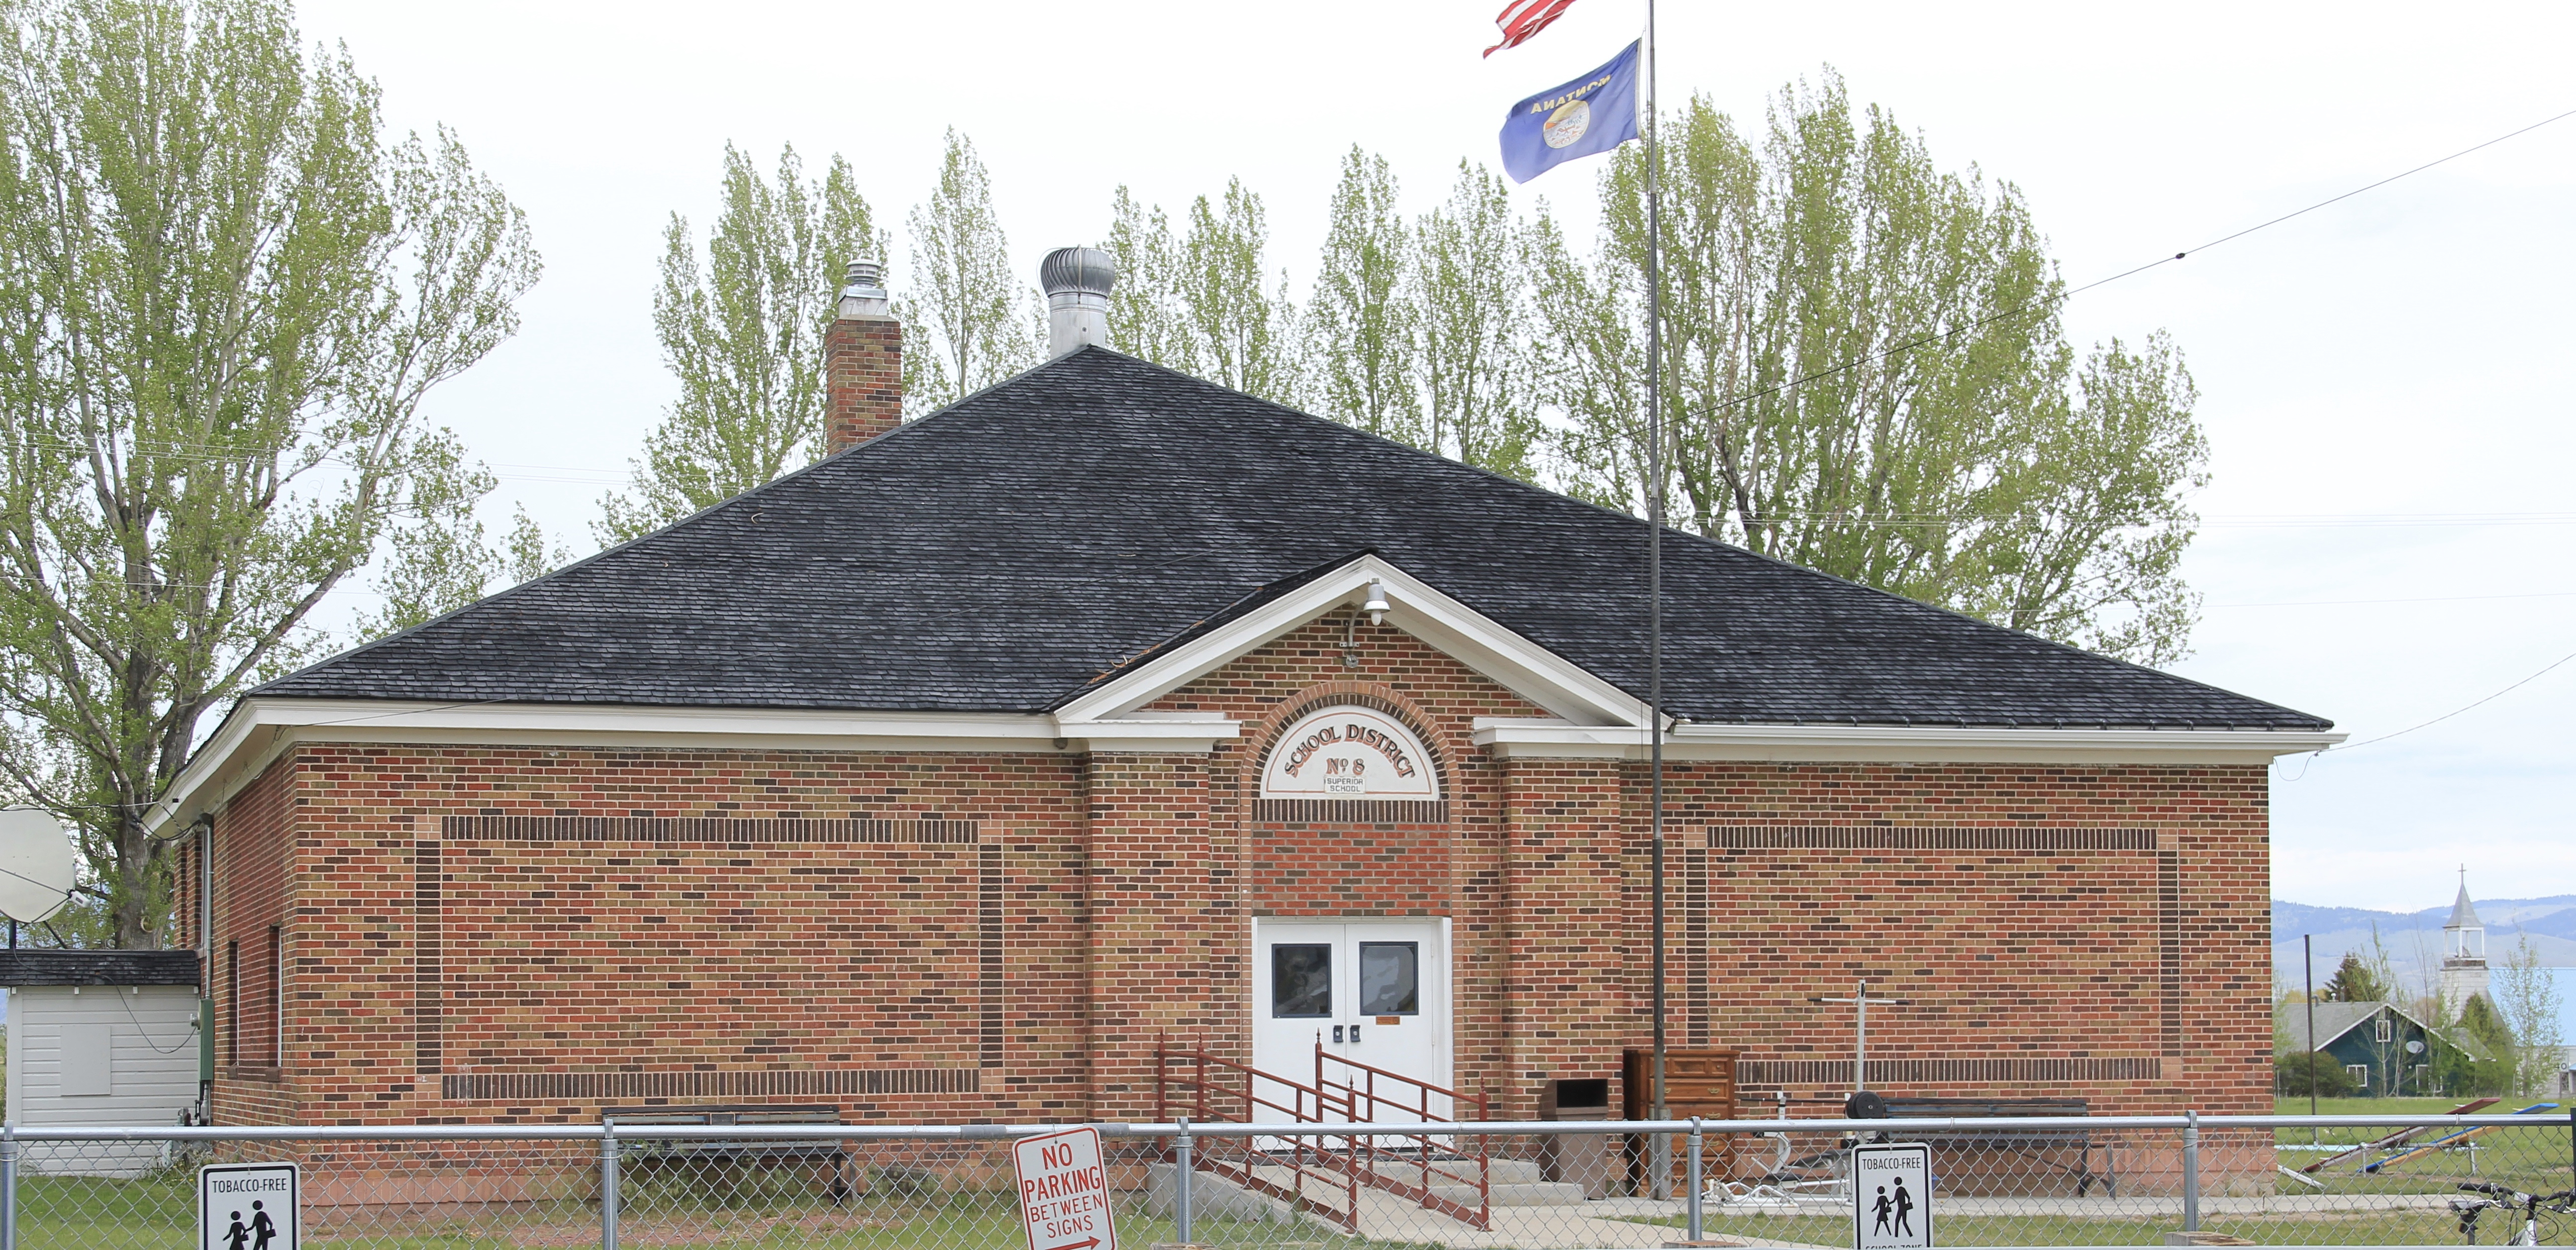 Granite Co Hall school MT 513